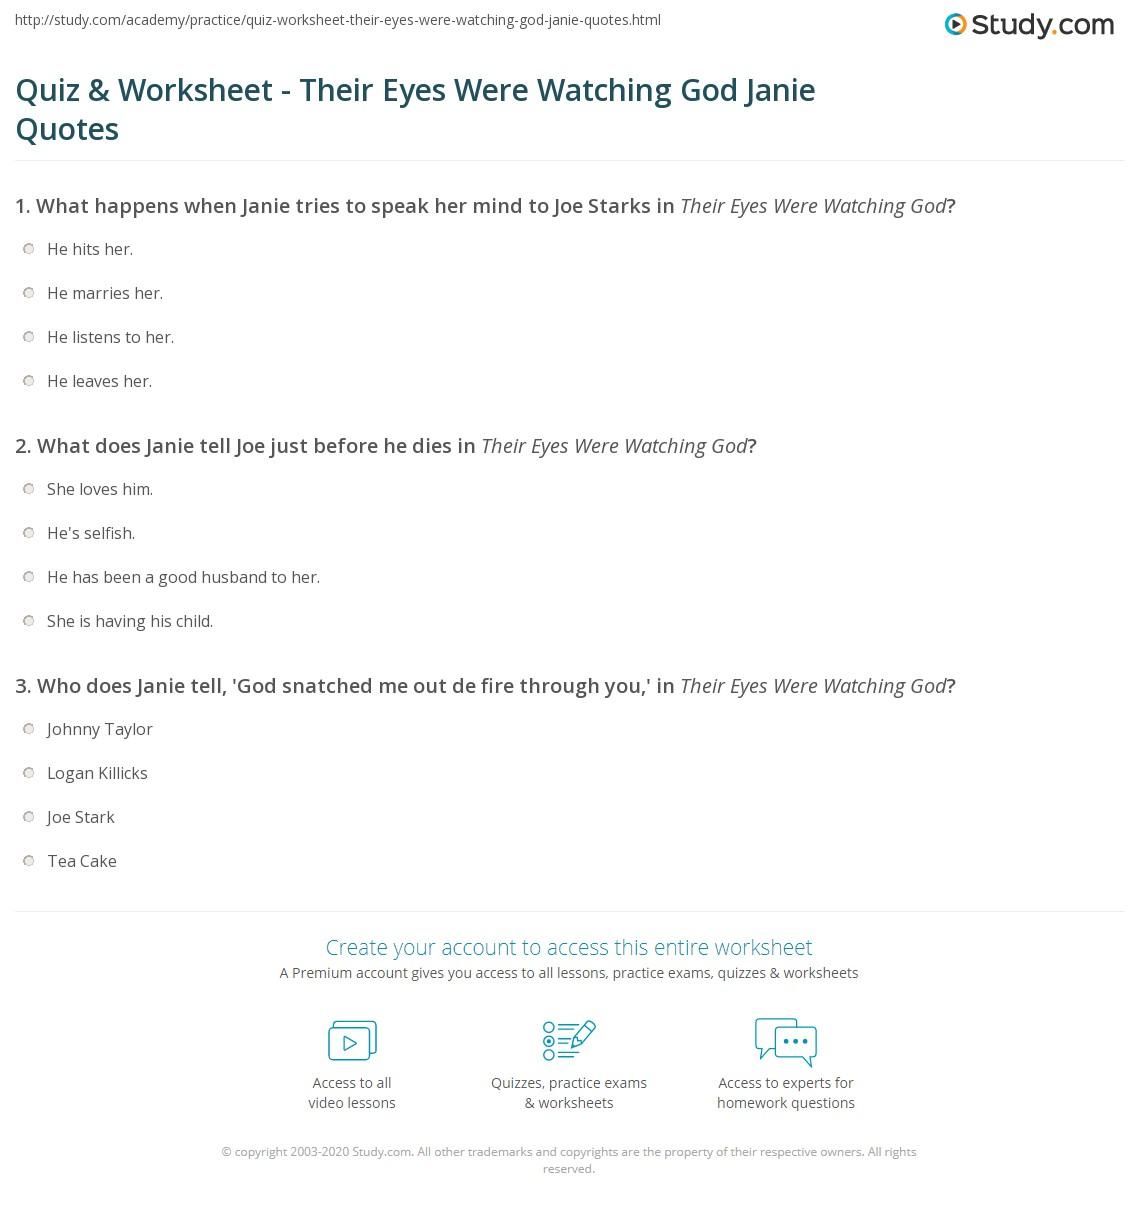 Quiz Worksheet Their Eyes Were Watching God Janie Quotes Studycom